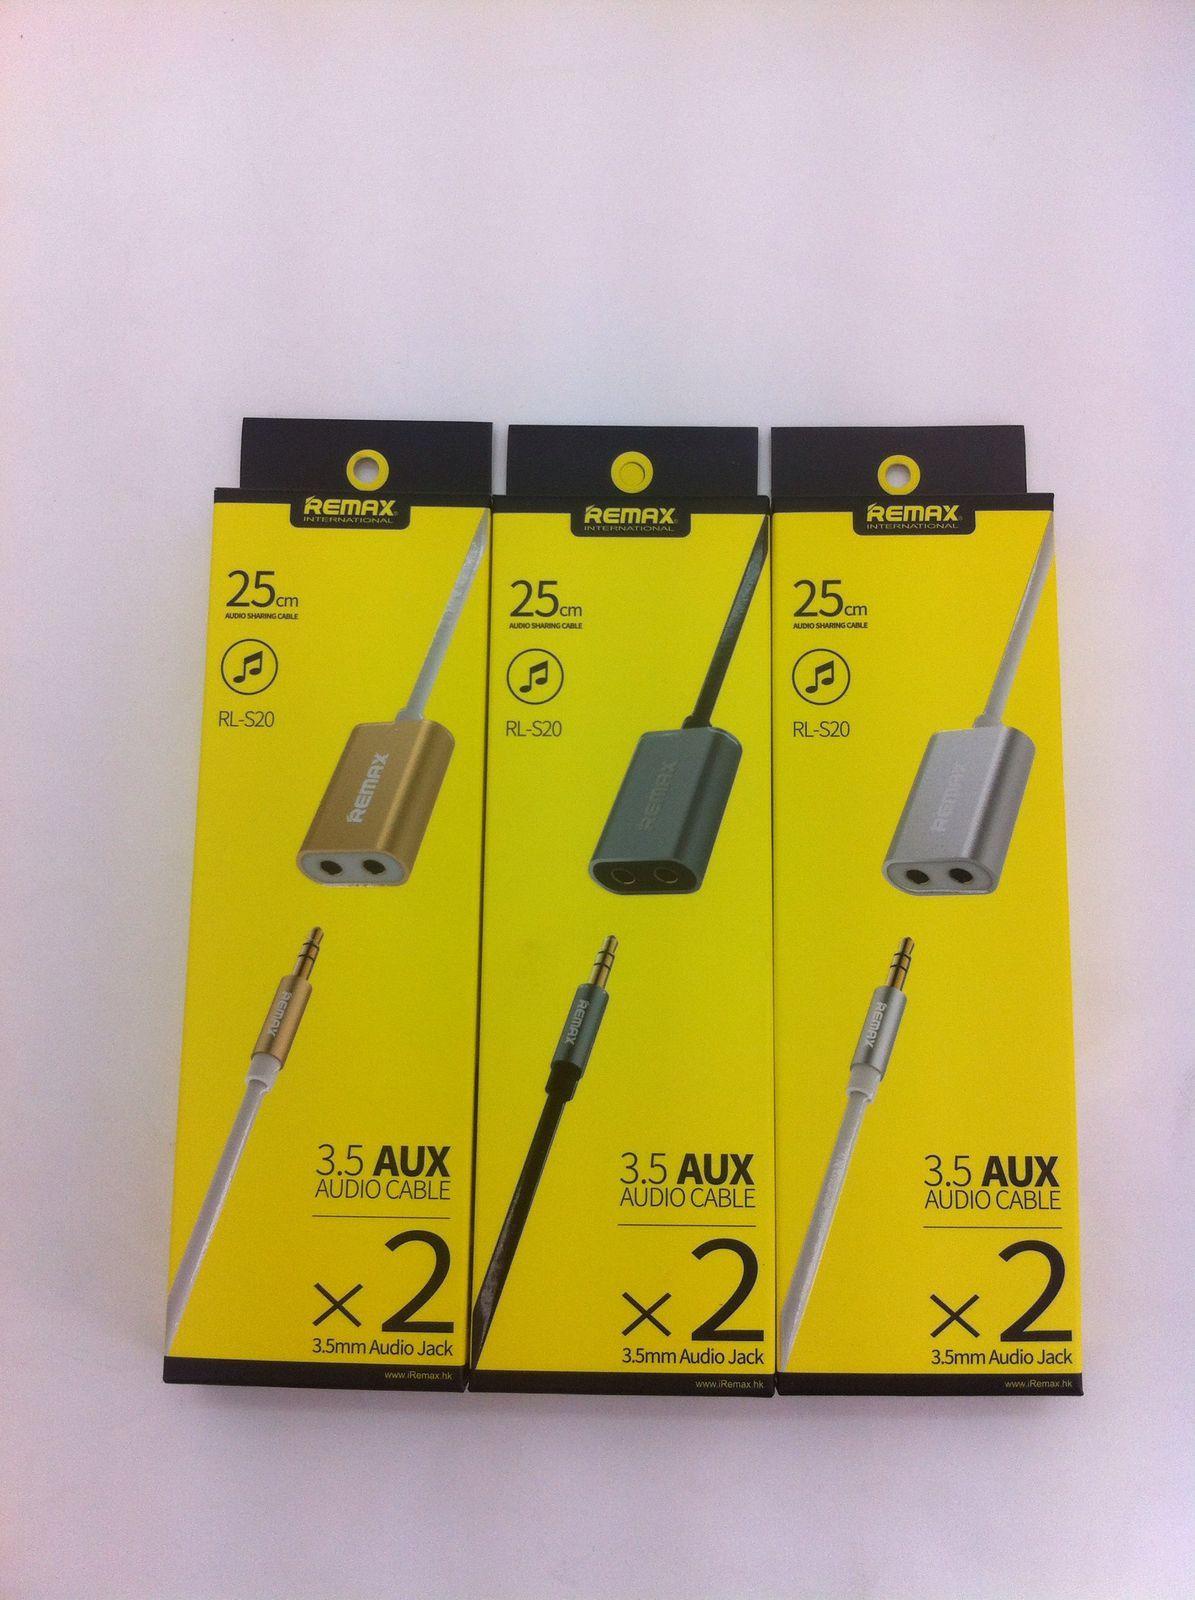 Jual Remax Cable Aux Audio Splitter 35mm Kabel Rl 20s